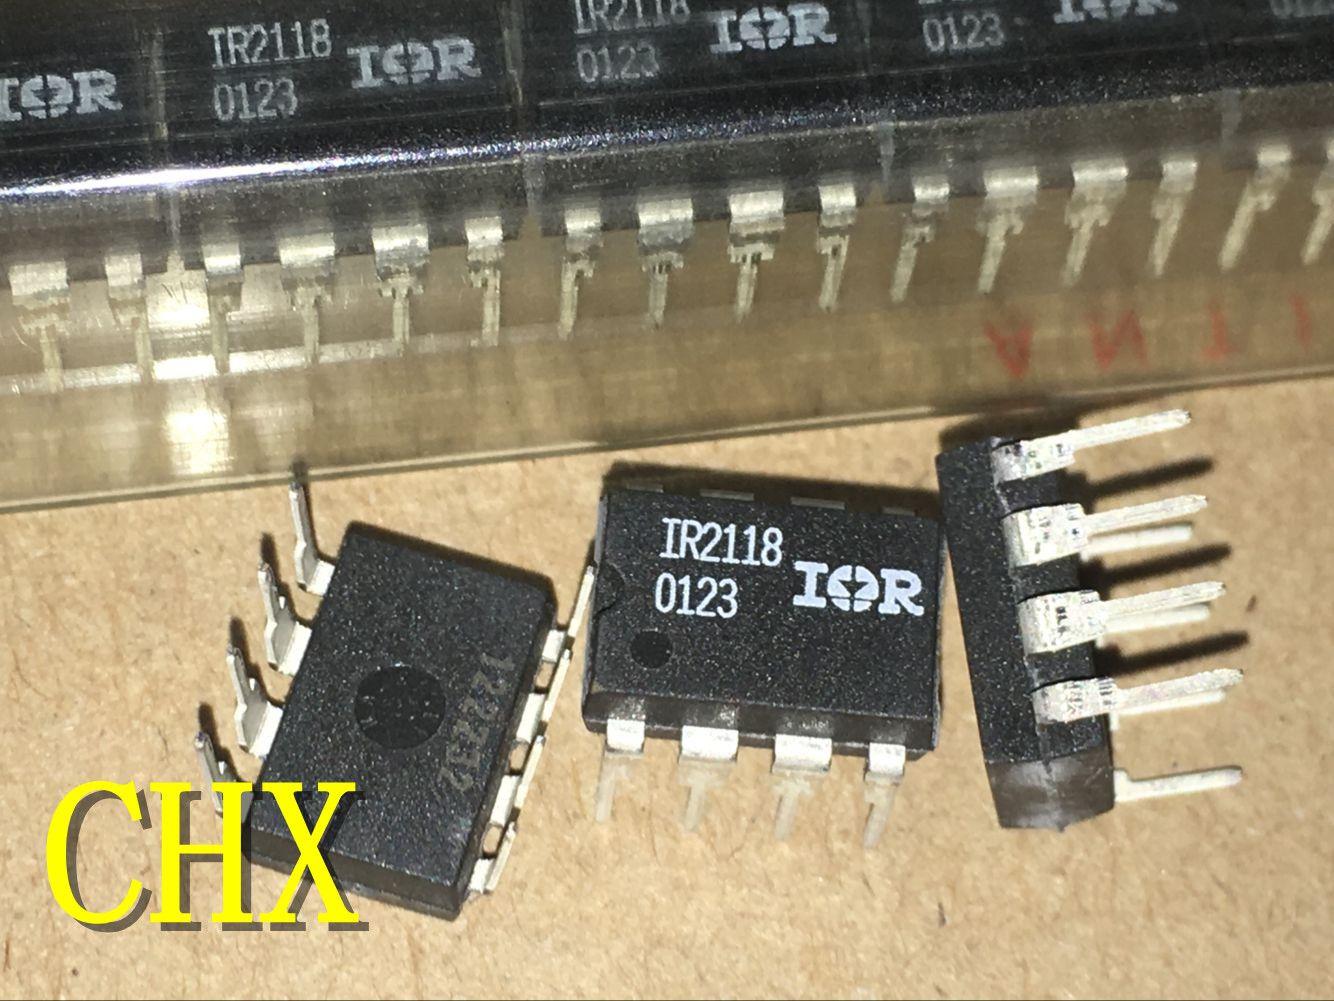 2 / ADET Yeni ve orijinal TNY276P TNY276PN TB2933H TB2933HQ TDA11135PS / V3 / 3 / AG9 TL494CN 15ETL06S LA42052 L4943 IR2118